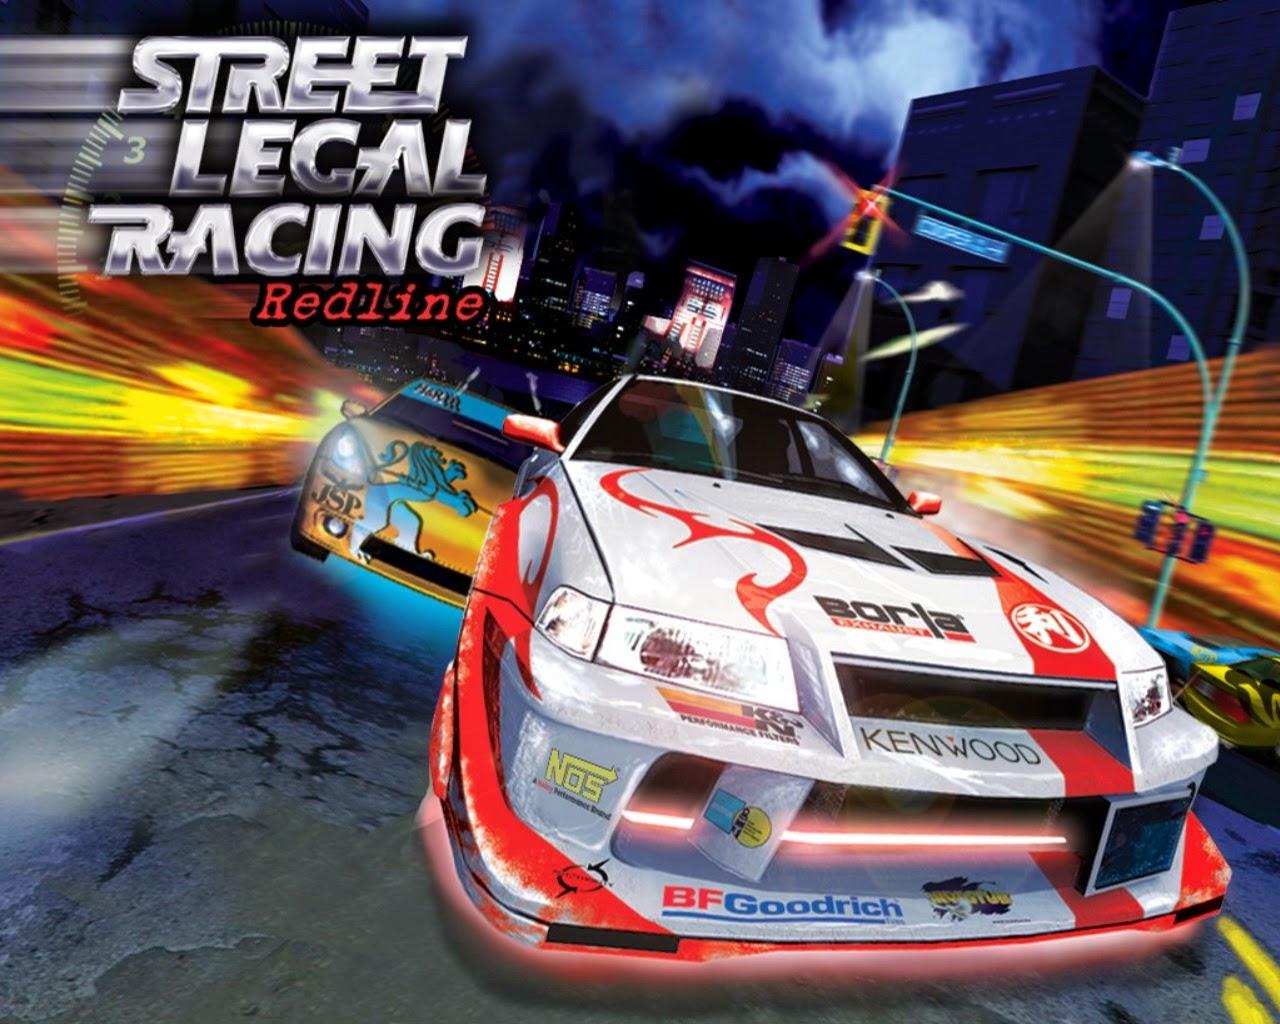 Street Legal Racing: Redline « IGGGAMES